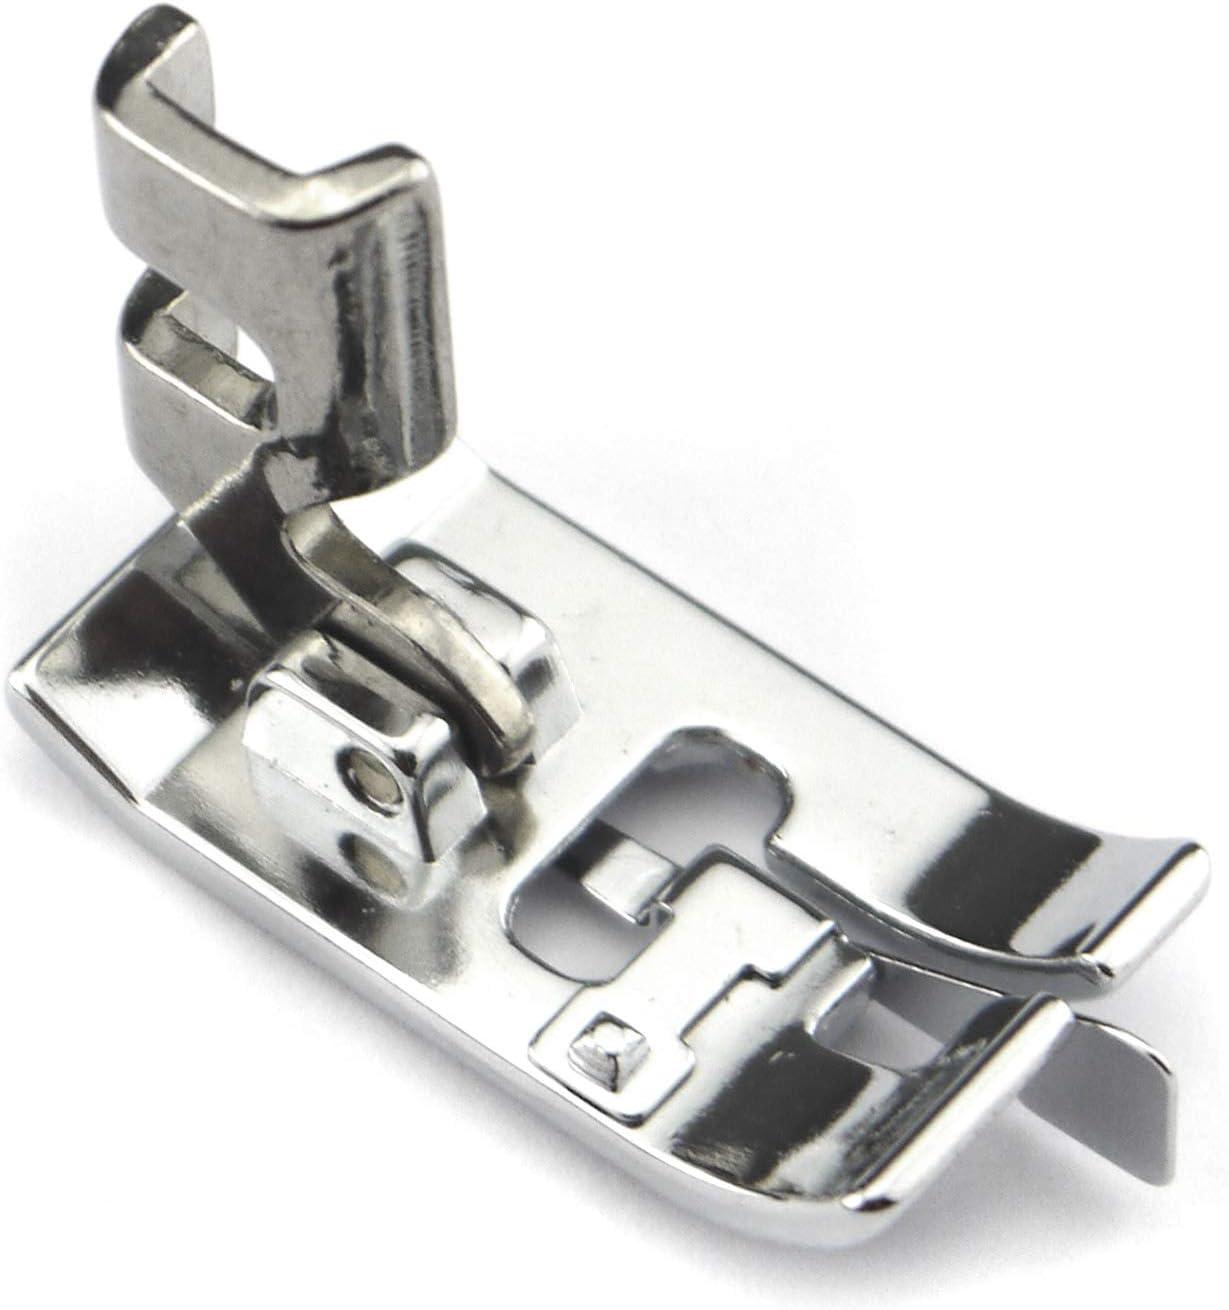 DREAMSTITCH 255L Prensatelas de caña baja para máquina de coser ...